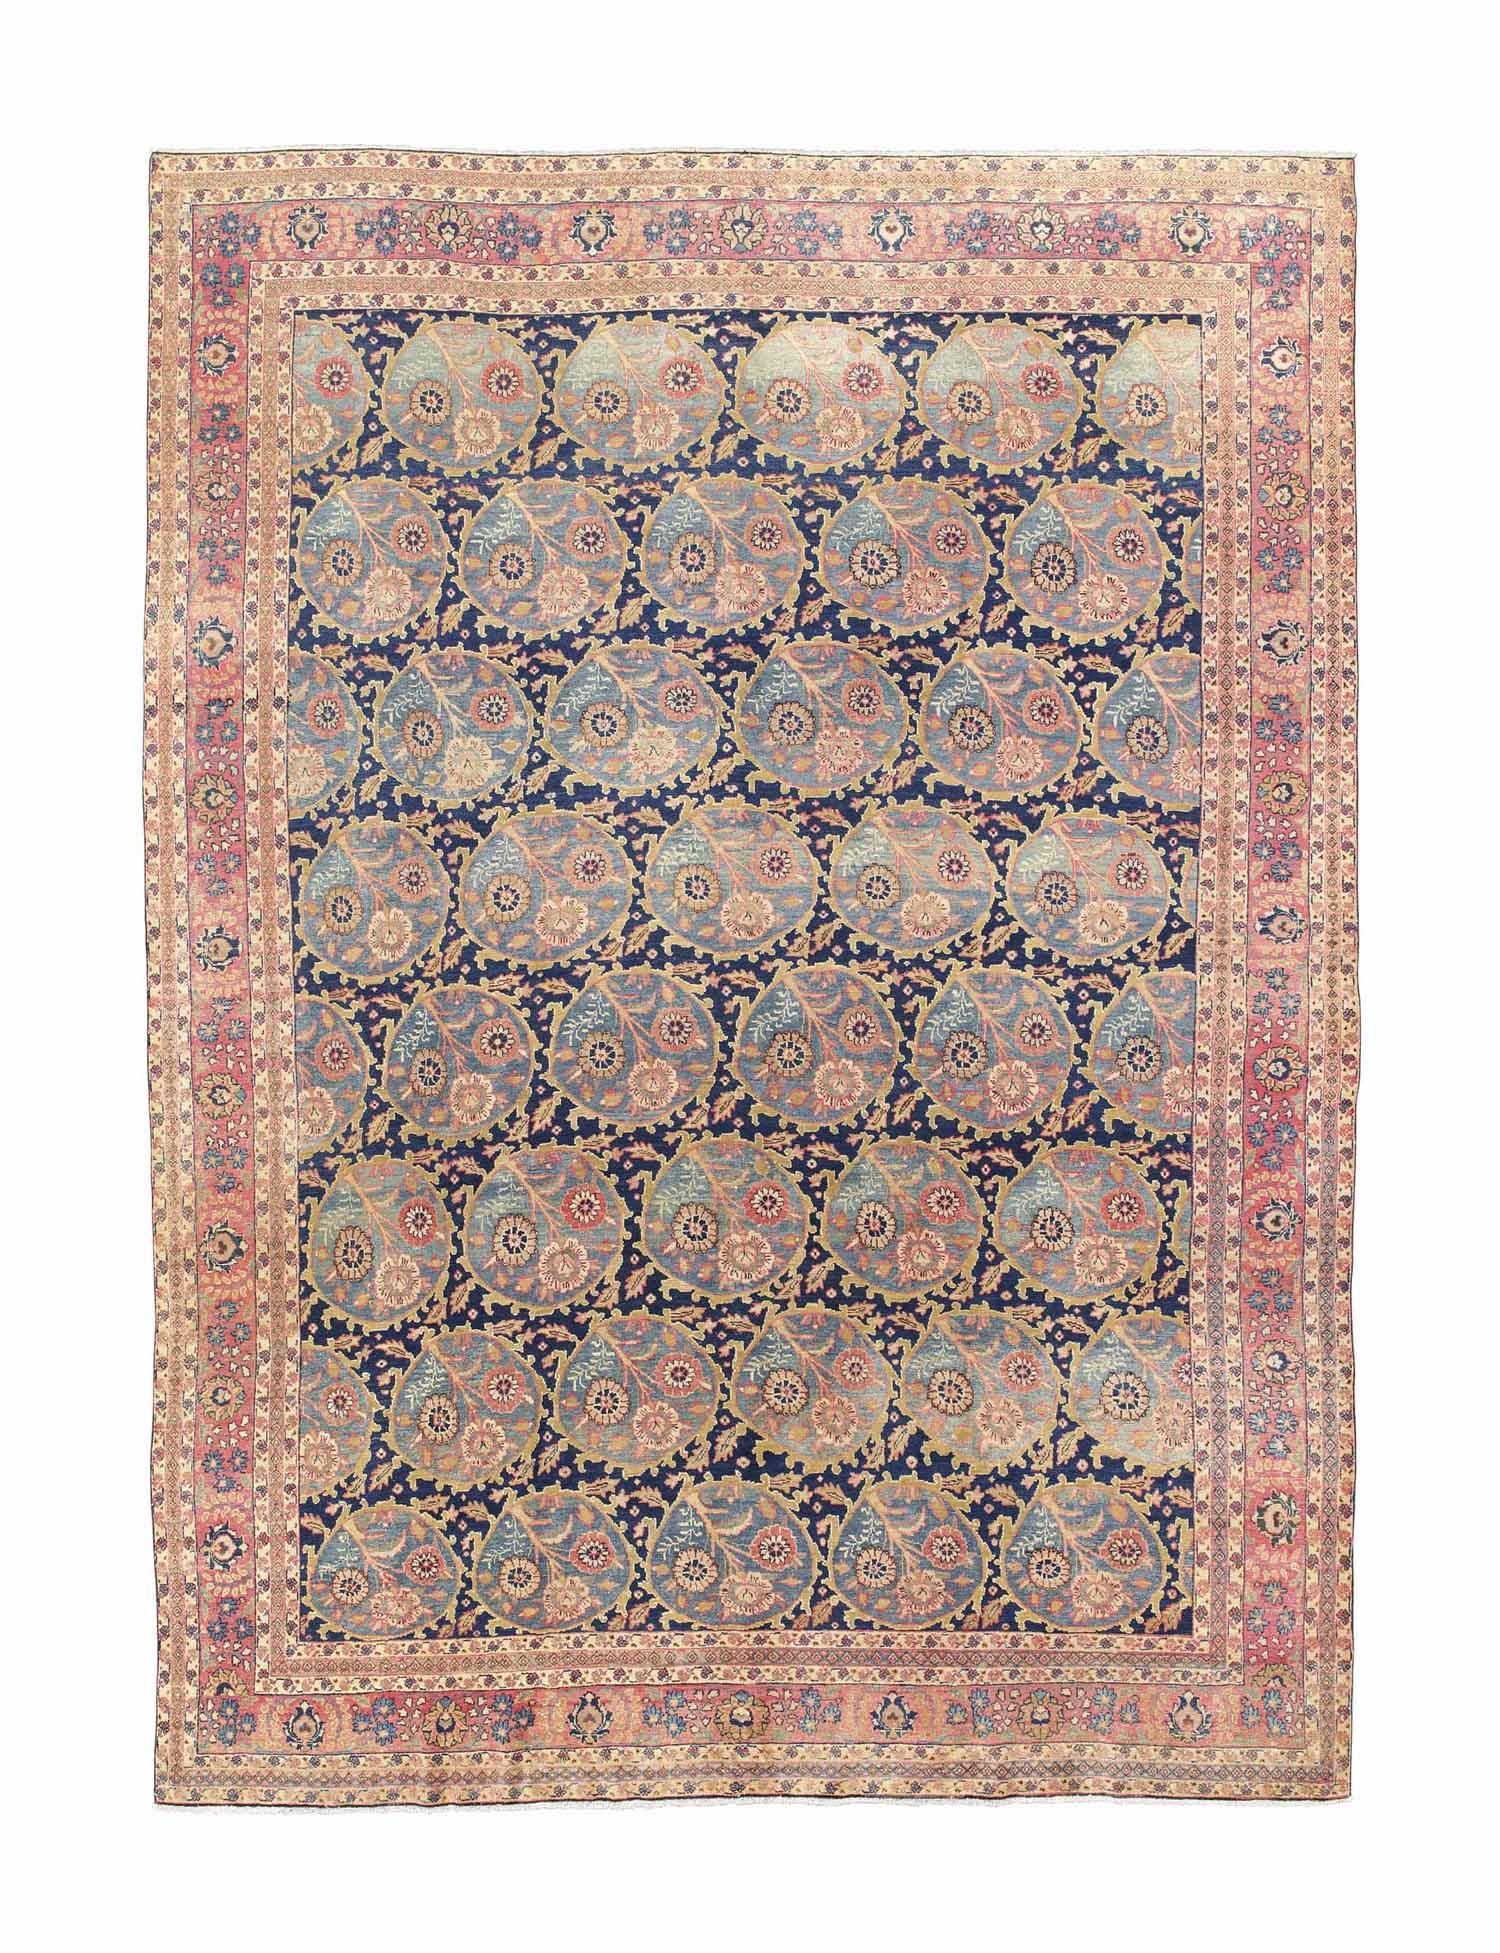 A fine Khoy Tabriz carpet